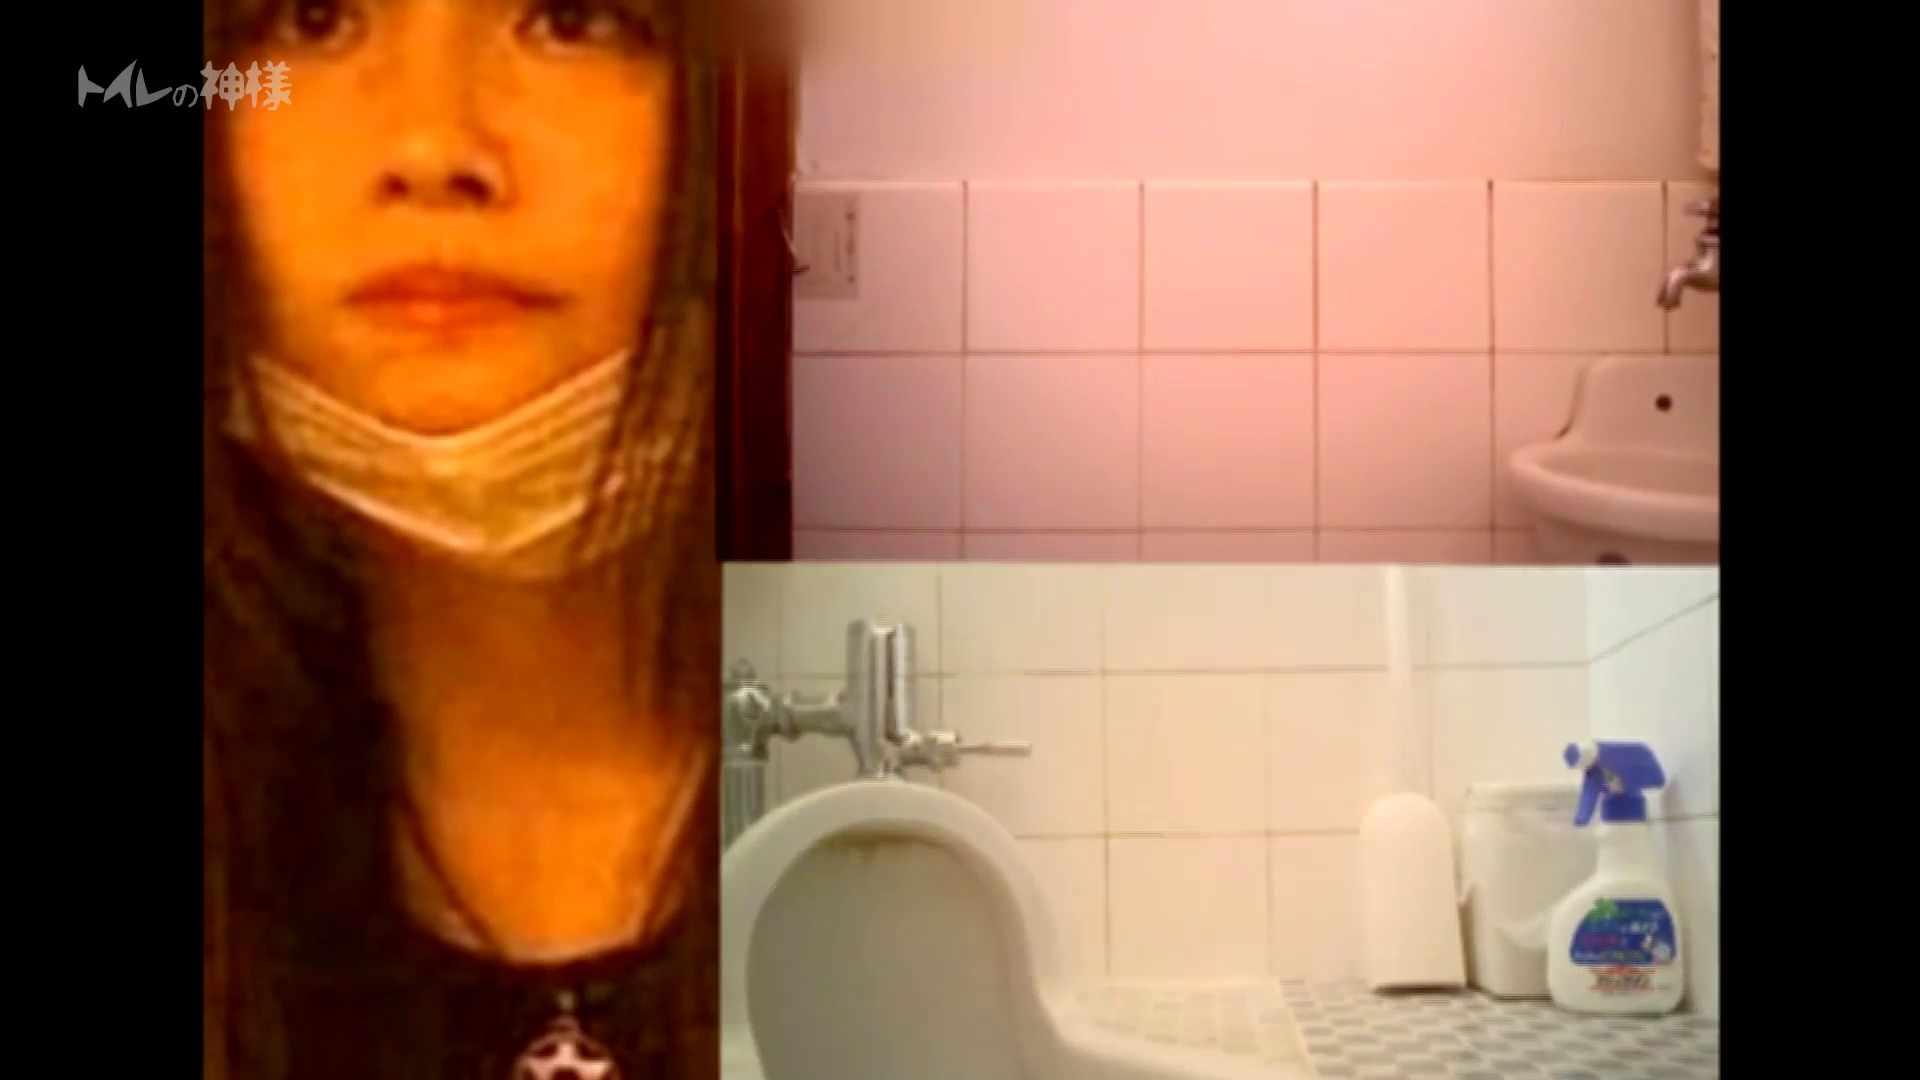 Vol.02 花の女子大生うんこ盗撮2 萌え女子大生 | 女体盗撮  97連発 91